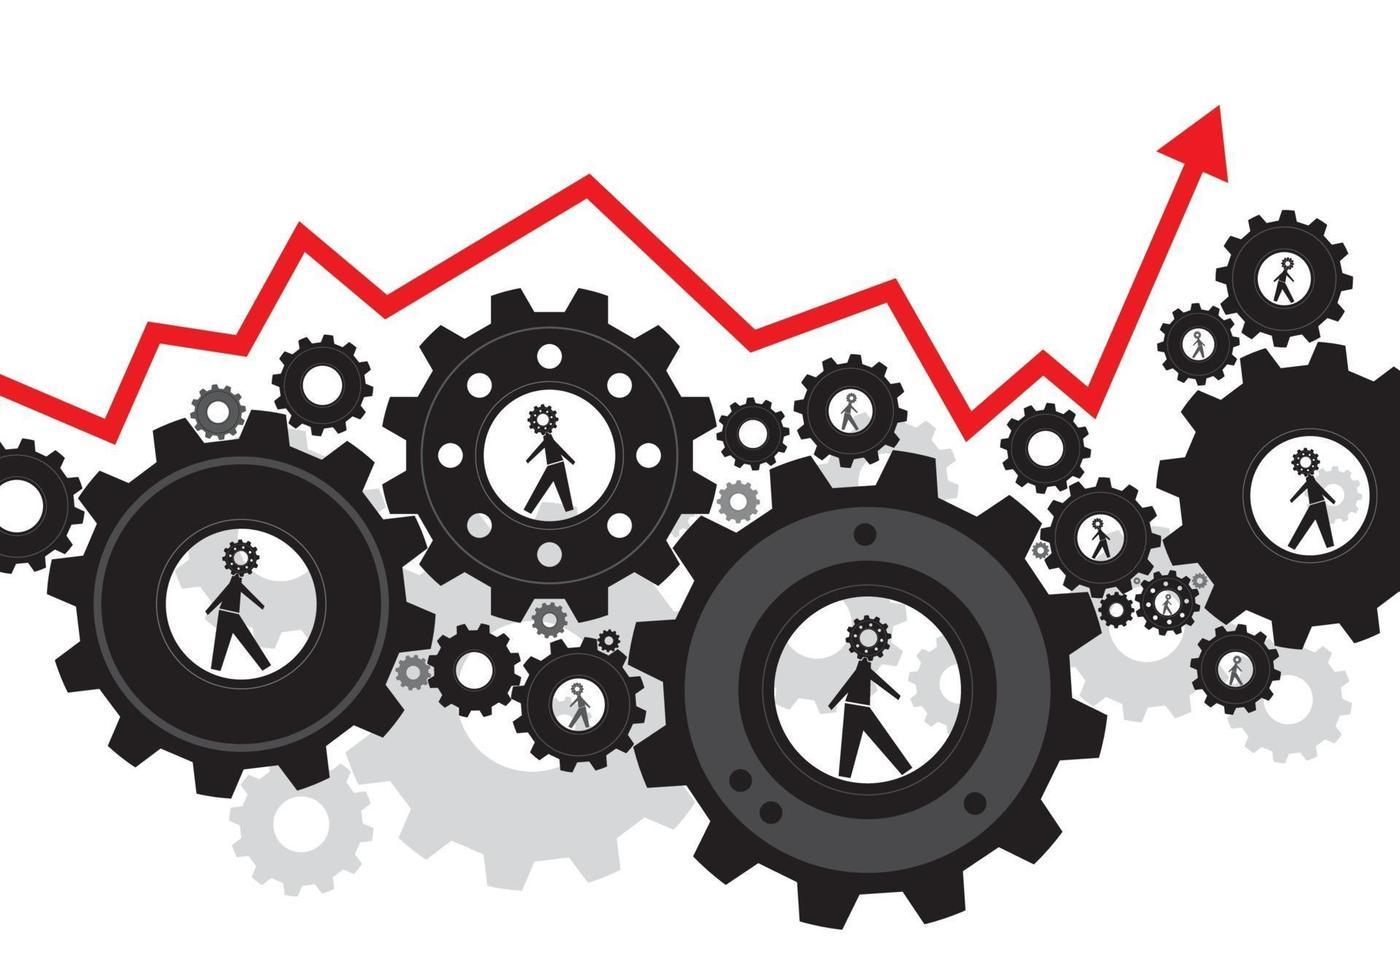 Human Gear Design Business Teamwork Konzept Vektor-Illustration vektor